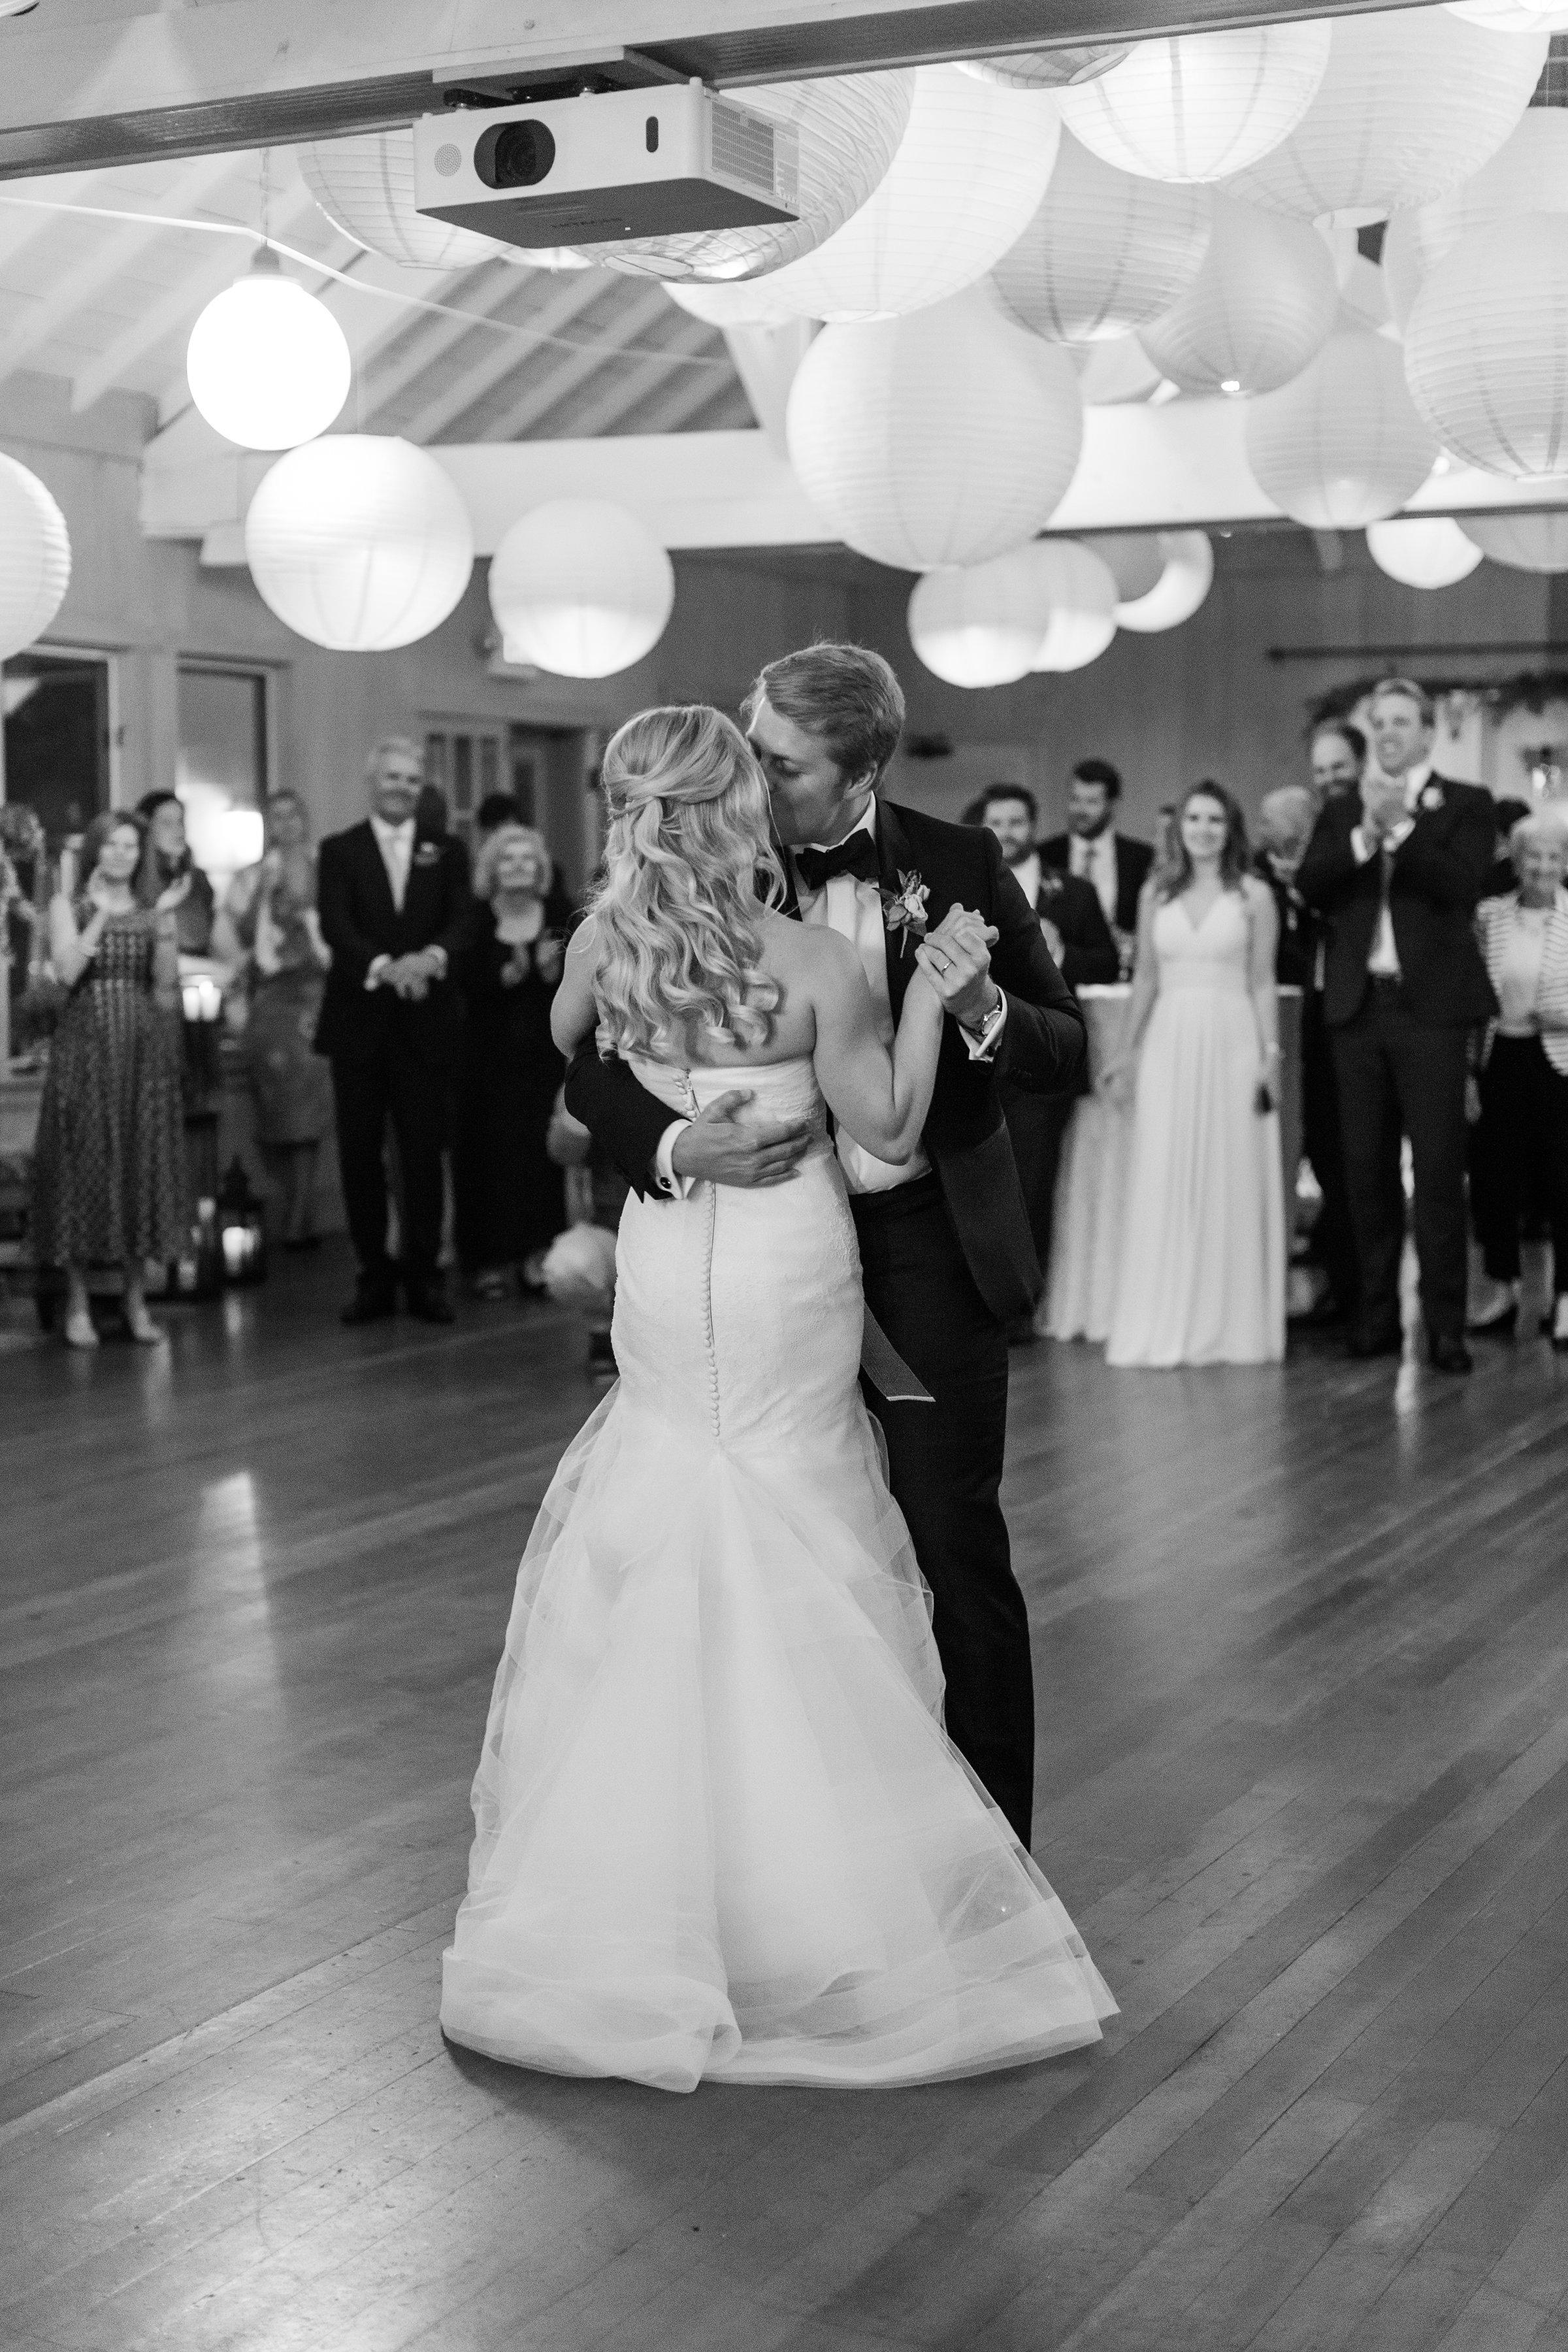 Coffman+Wedding+Reception-186.jpg